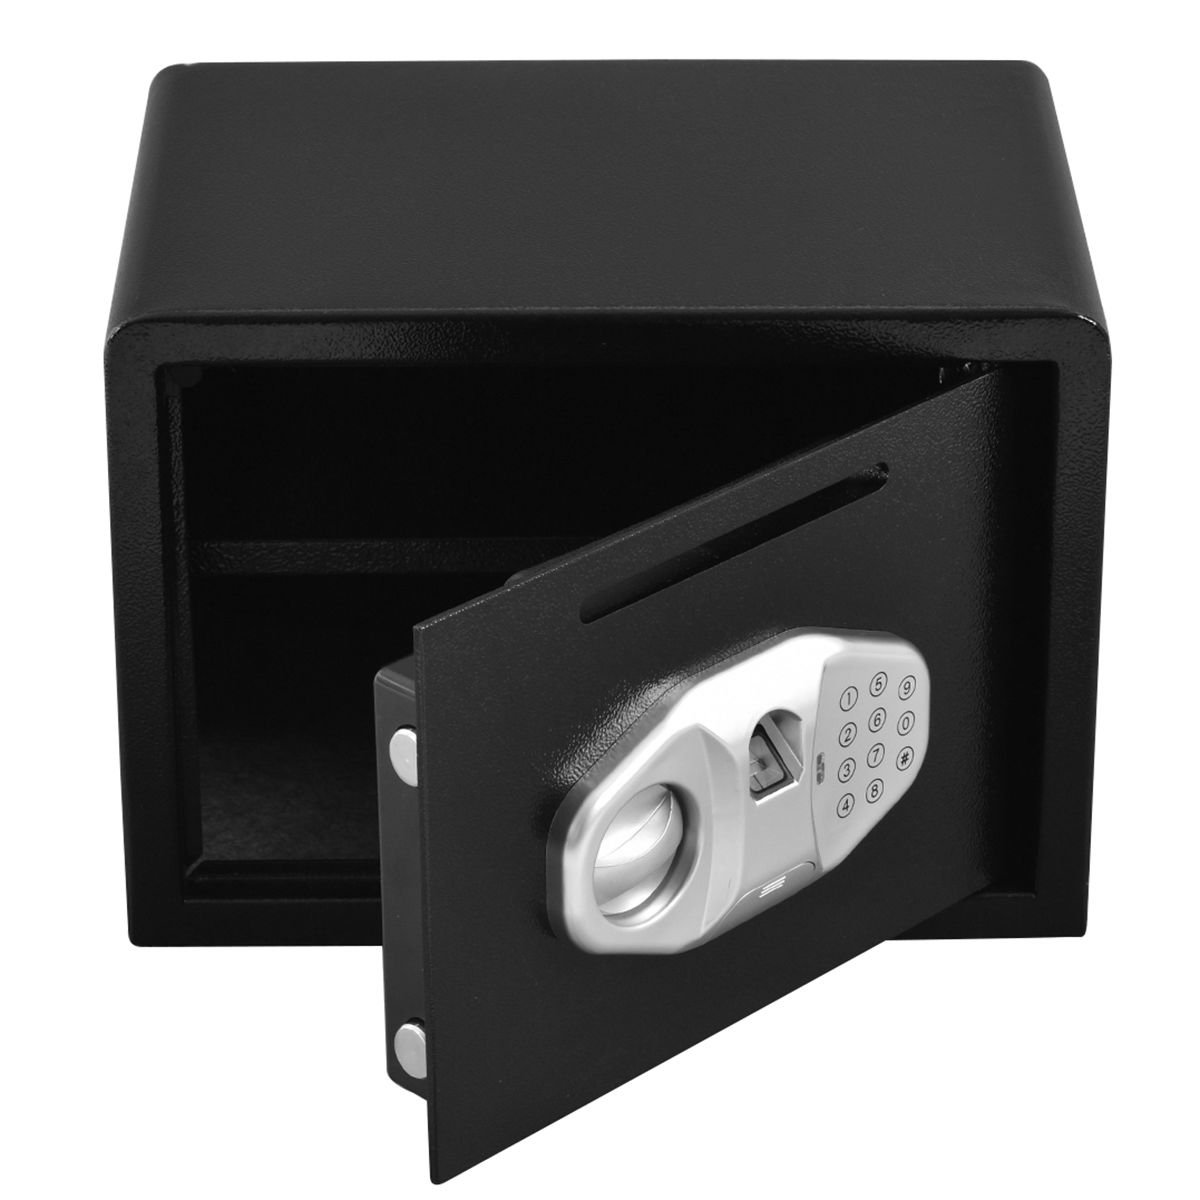 Safstar Cabinet Safes Biometric Fingerprint Electronic Digital Keypad Lock Security Box for Cash Jewelry Passport Guns Collectibles (FS Fingerprint: 9.8'' x 13.7'' x 9.8'') by S AFSTAR (Image #4)